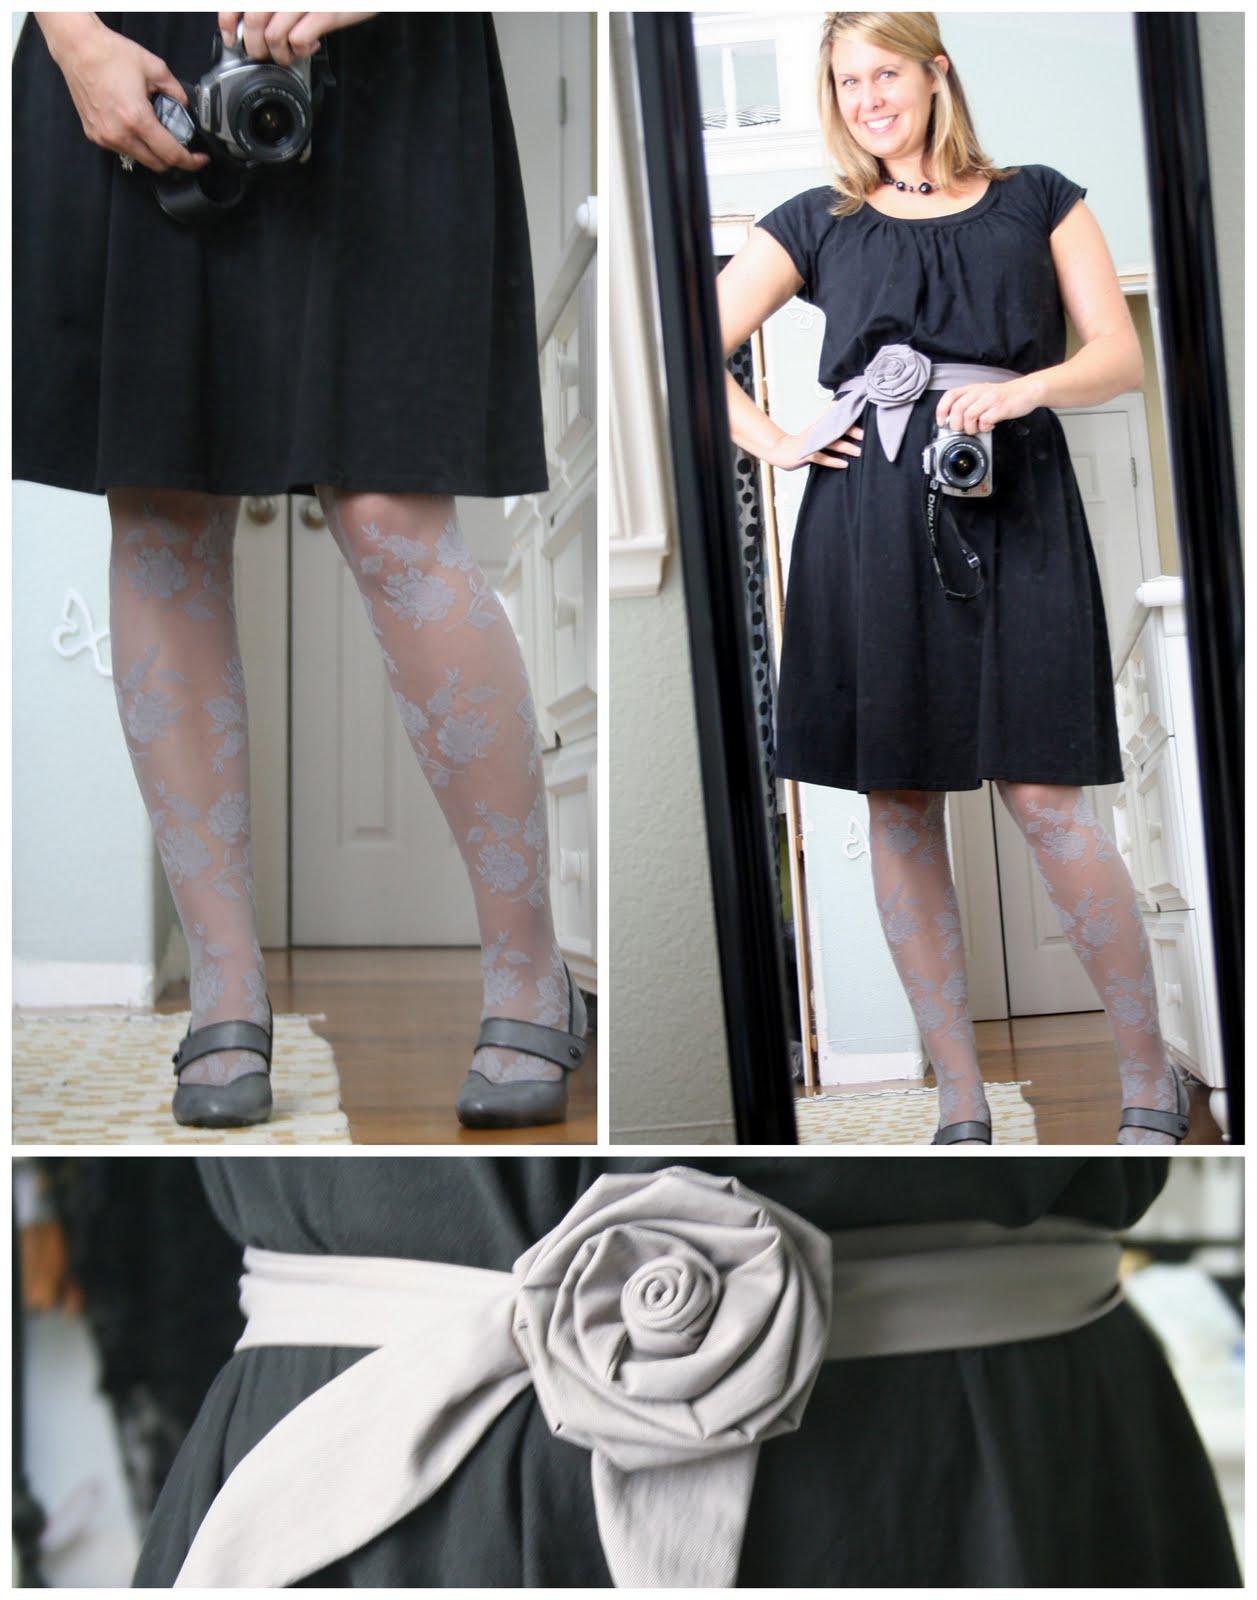 http://3.bp.blogspot.com/_aOXRcIUcl7Q/TNGAM6H8AUI/AAAAAAAAEvM/A0HU5eUMopM/s1600/outfits5.jpg